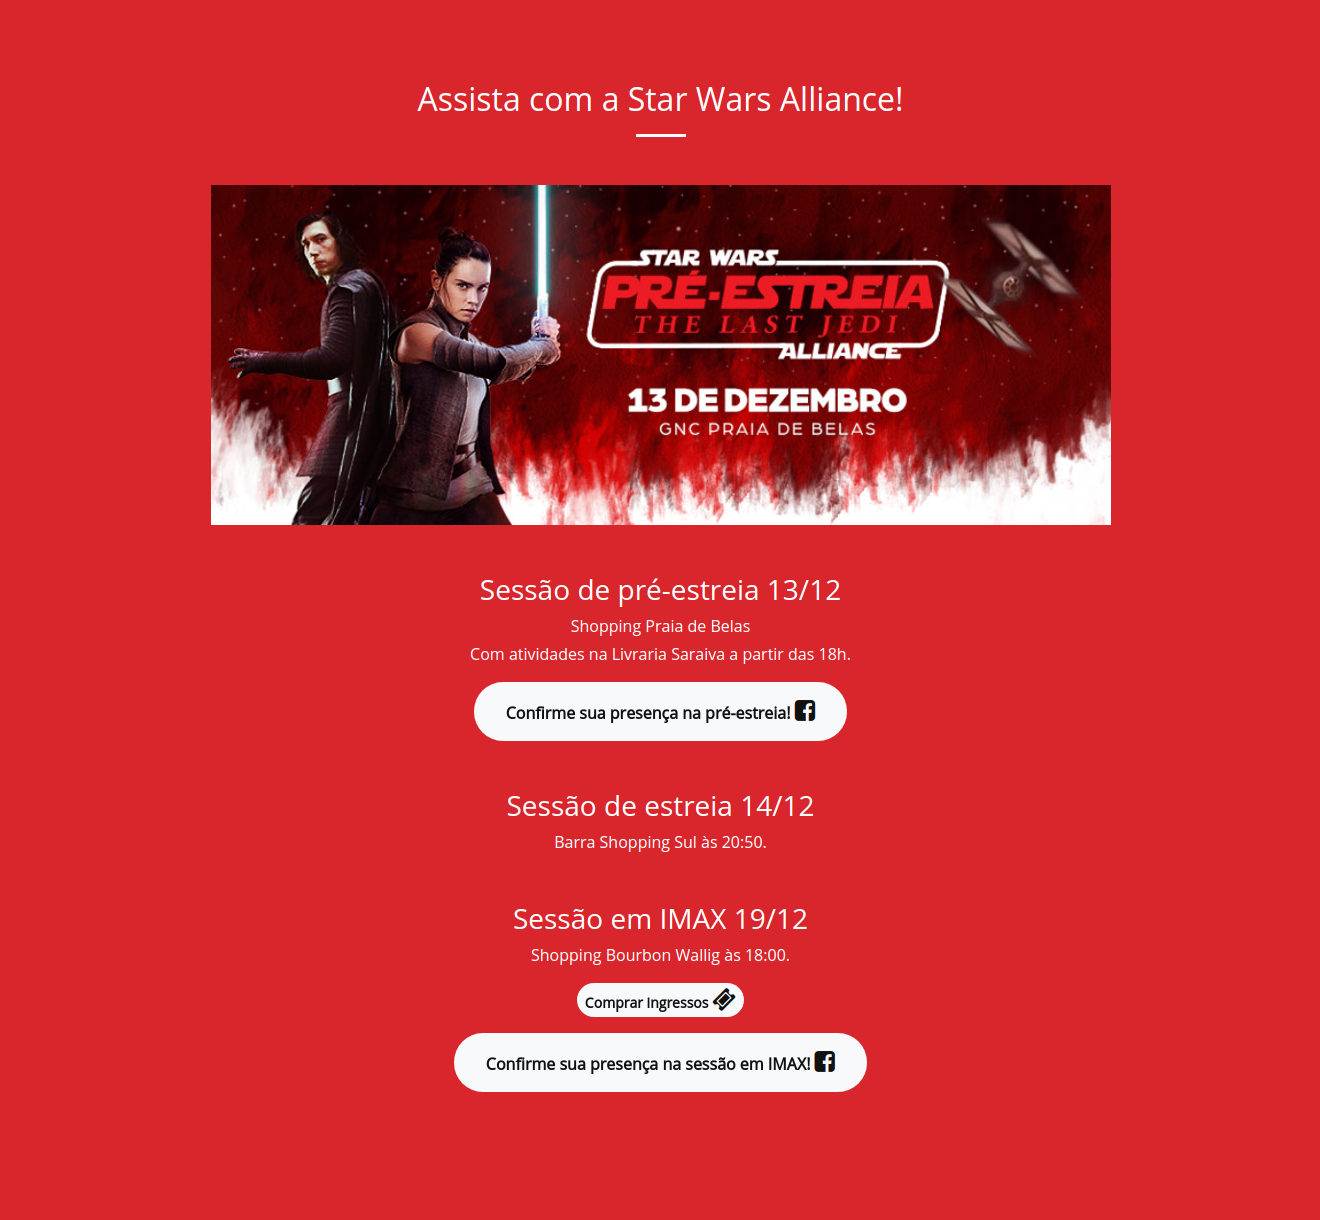 Assista com a Star Wars Alliance!